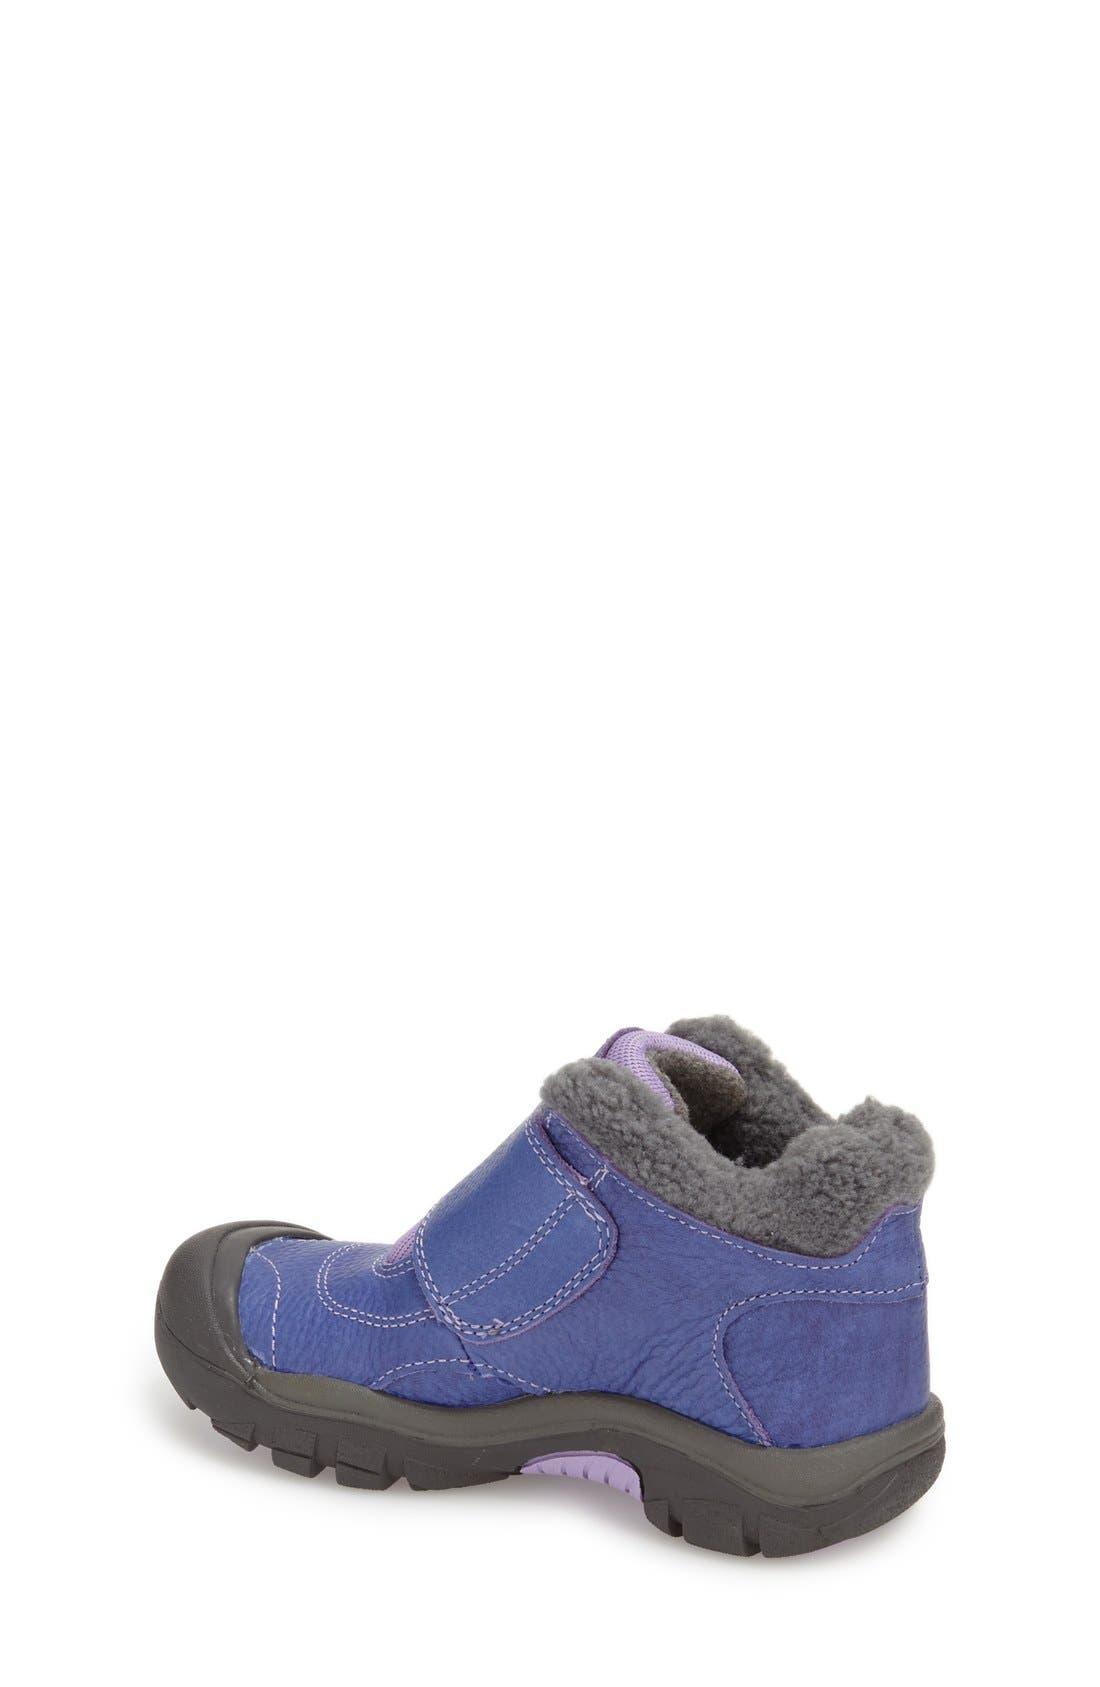 'Kootenay' Waterproof Winter Boot,                             Alternate thumbnail 4, color,                             400